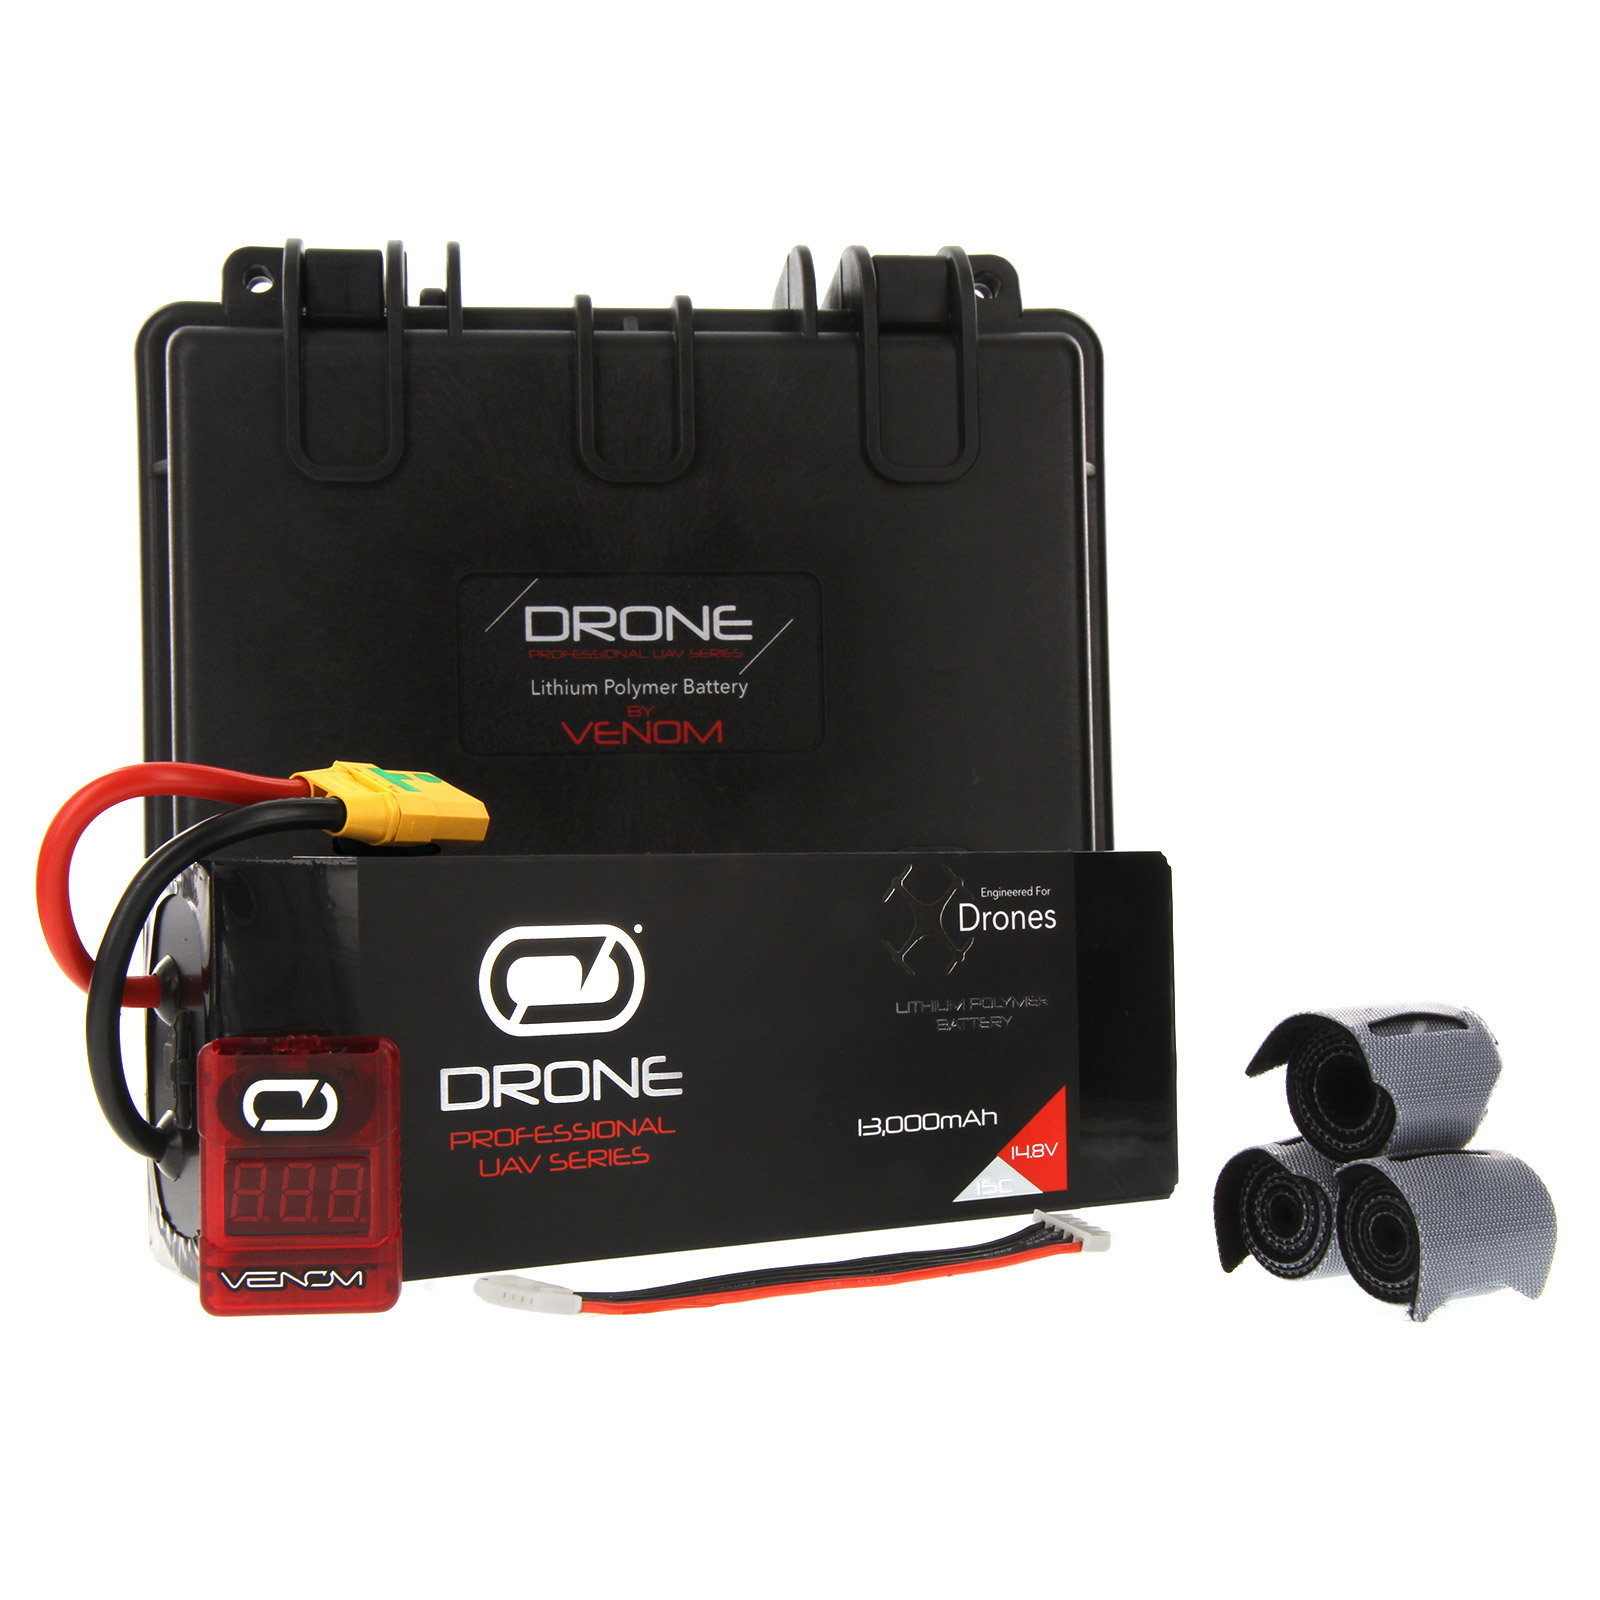 Infinite Jib Elite 15C 4S 13000mAh 14.8V LiPo Drone Pro Battery by Venom